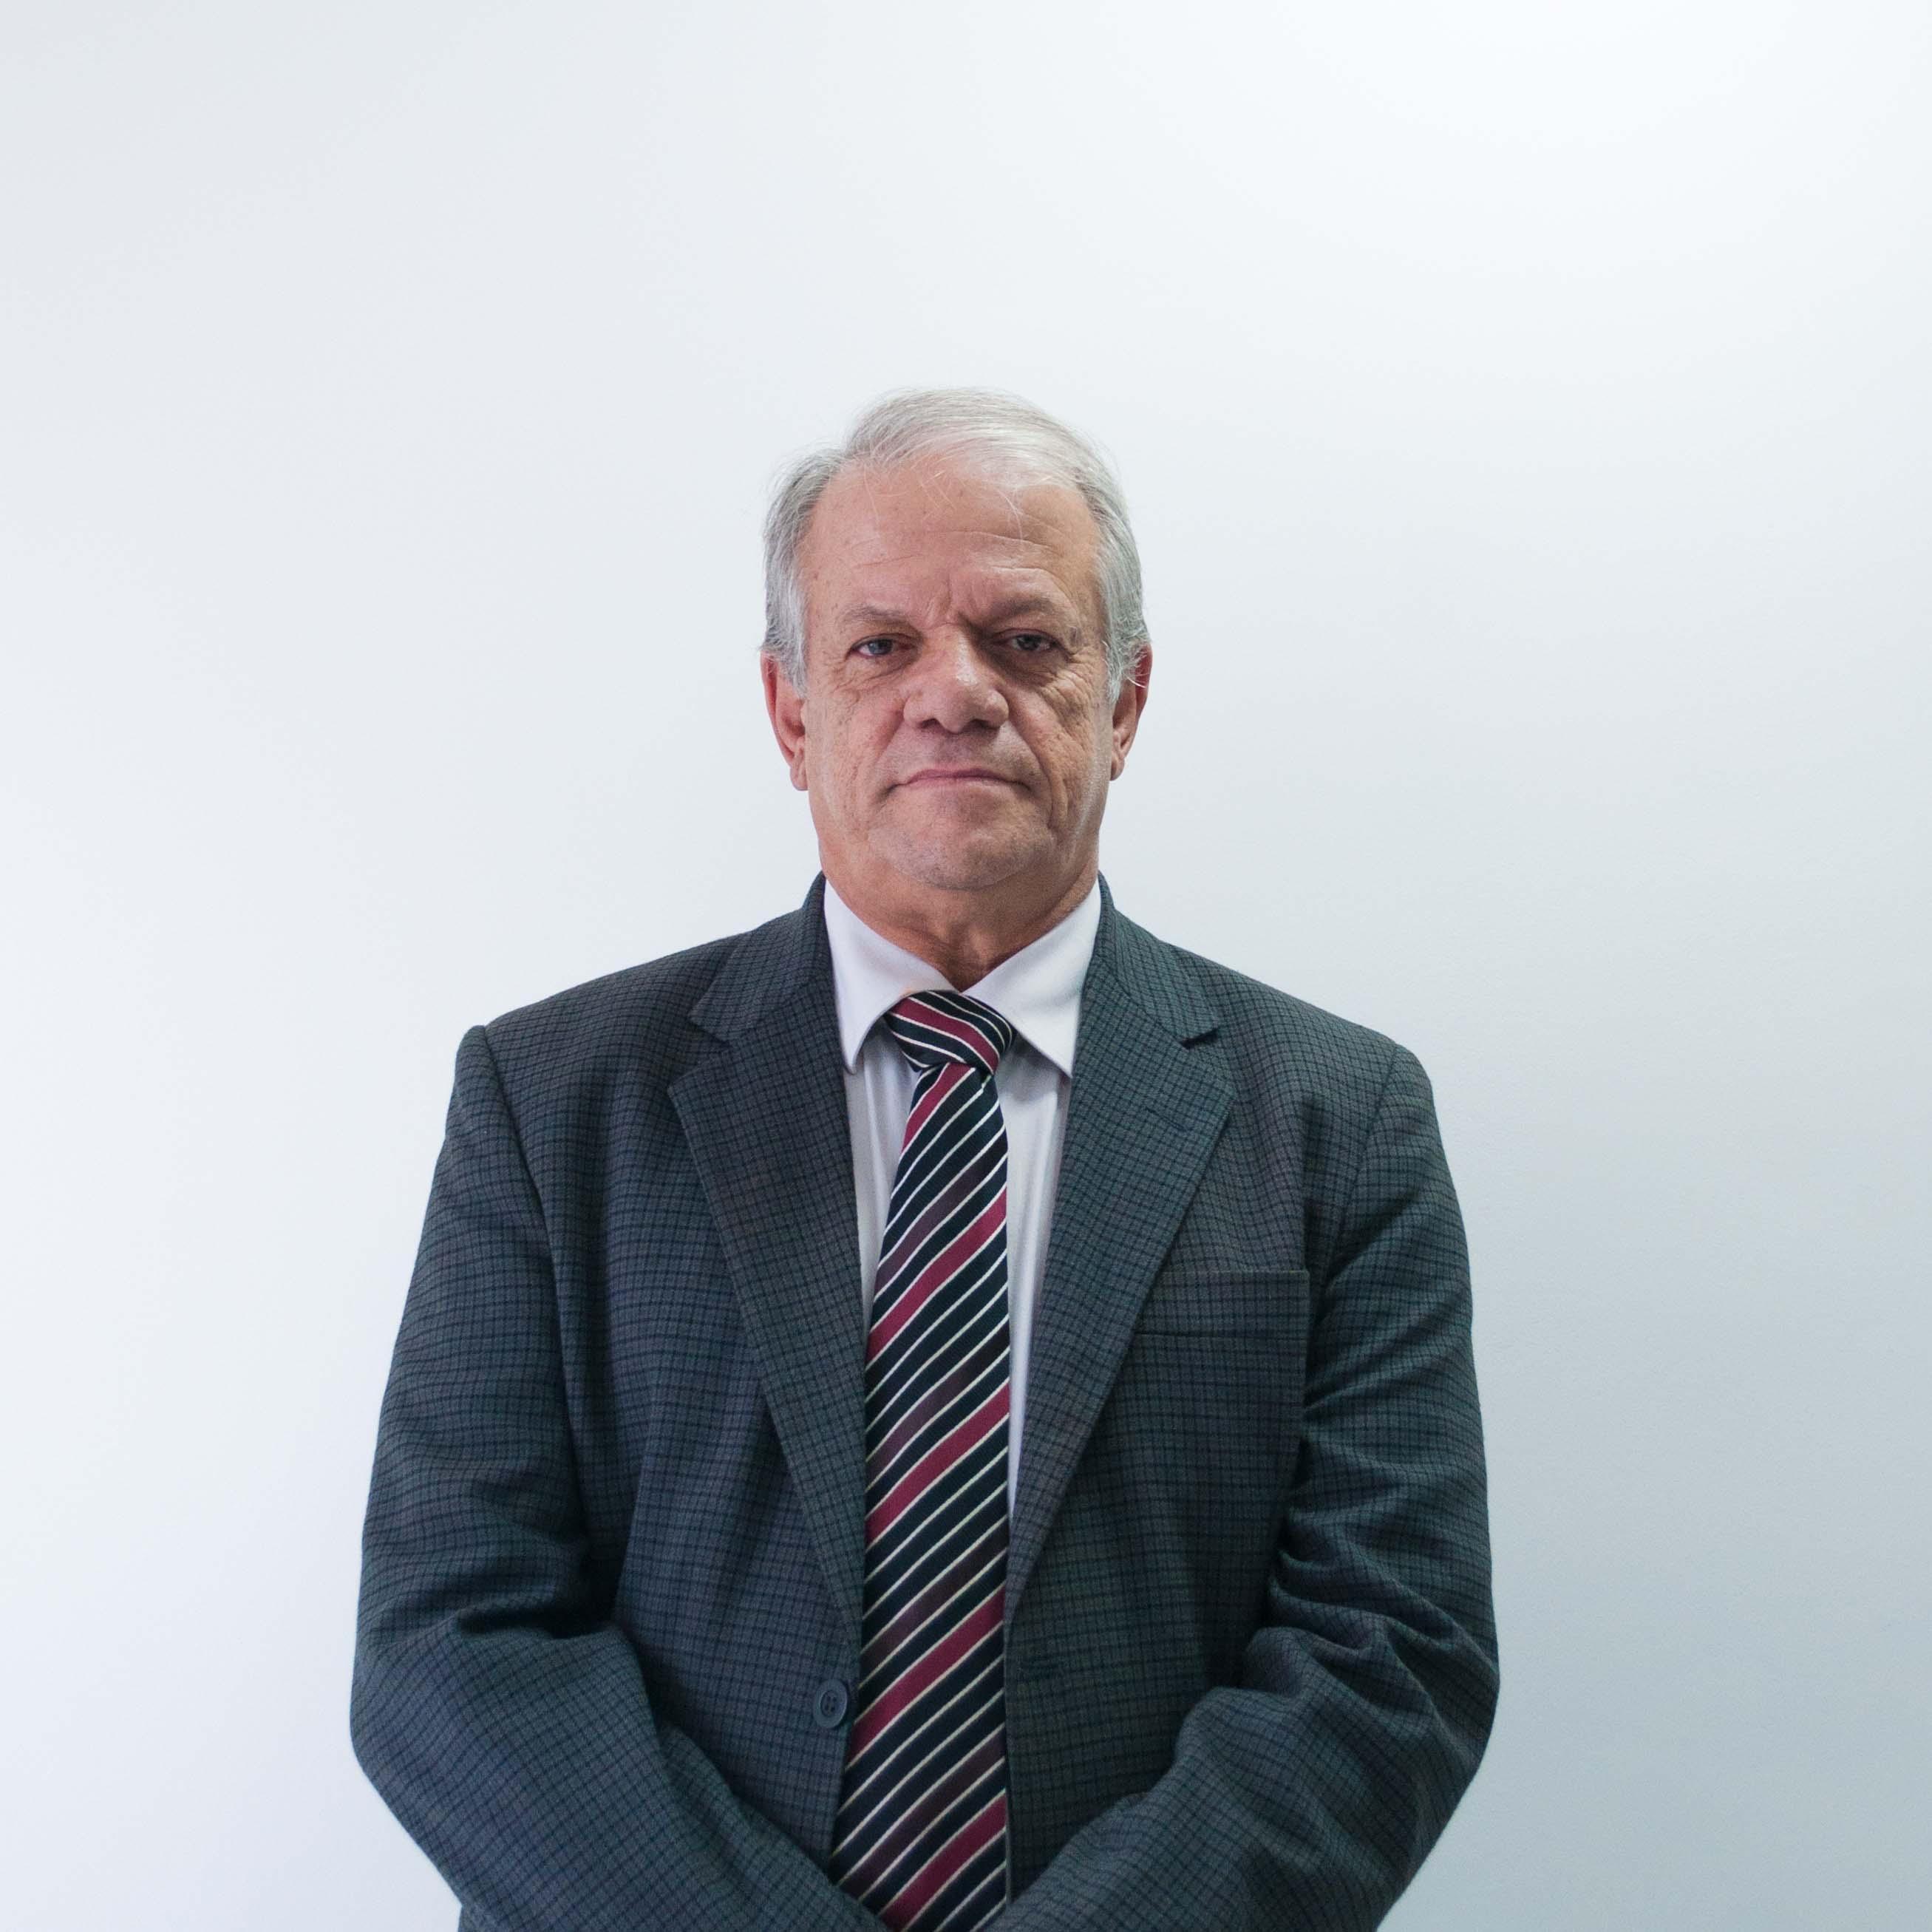 Carlos Siqueira